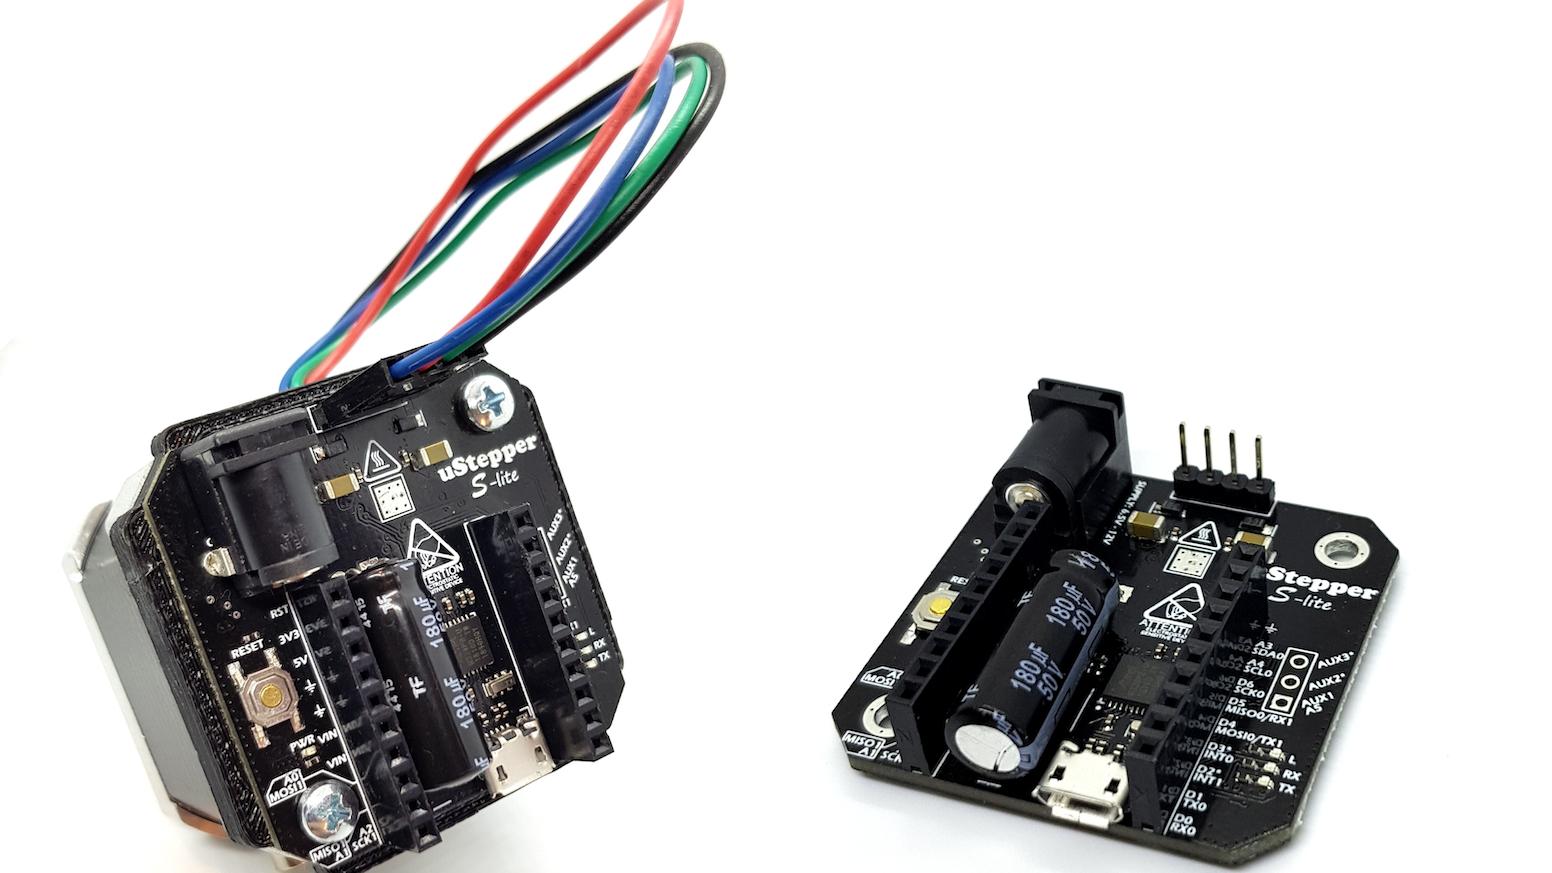 uStepper S line incorporates super silent stepper drivers, high resolution encoders and Arduino compatible MCU in a super slim design!